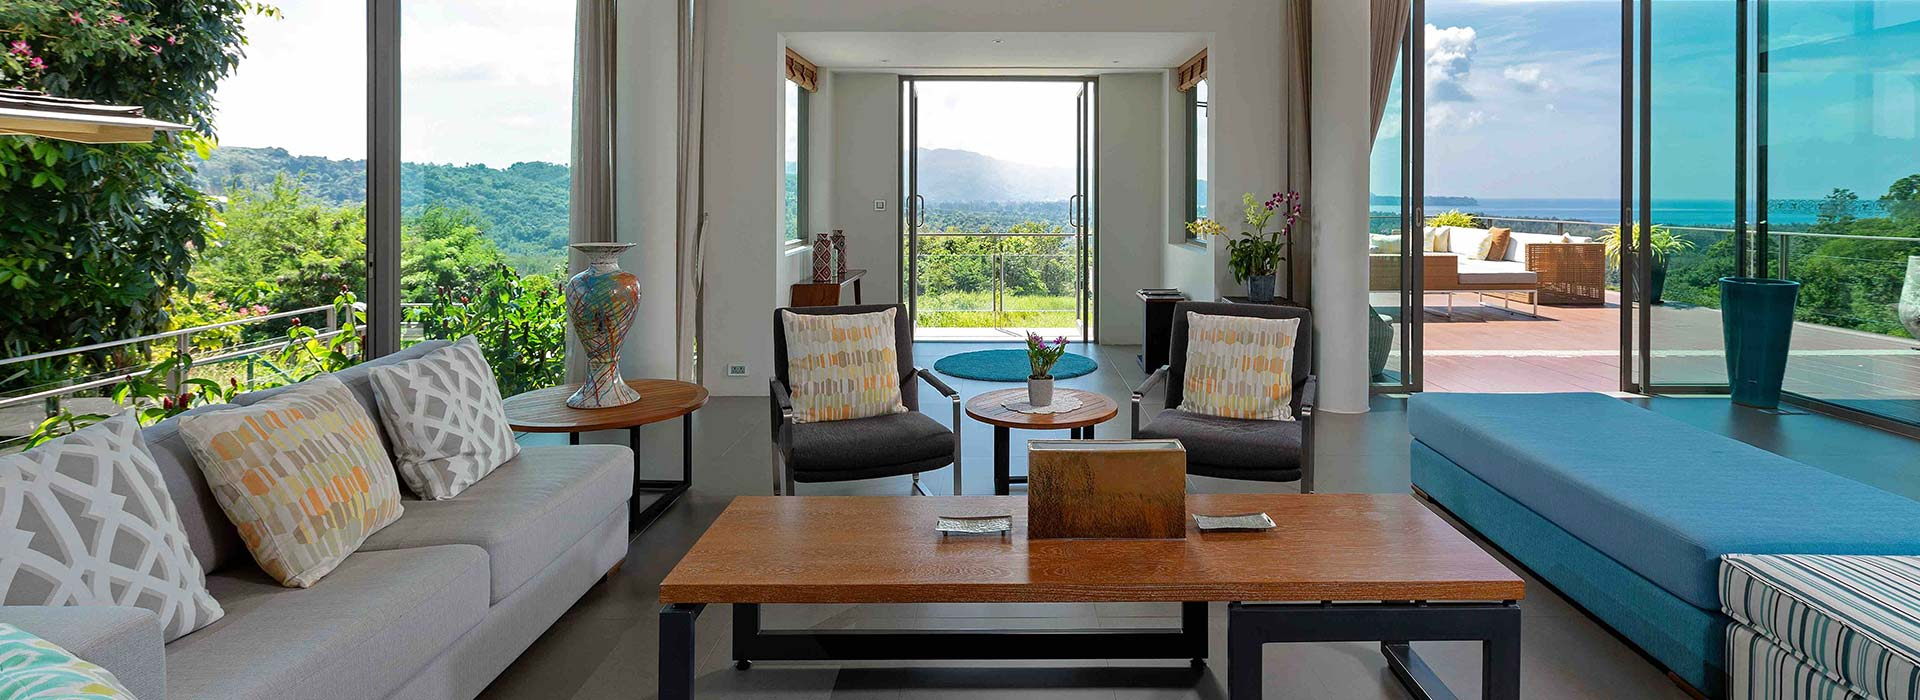 Suriyan 8 Bed Villa<br>Layan, Phuket